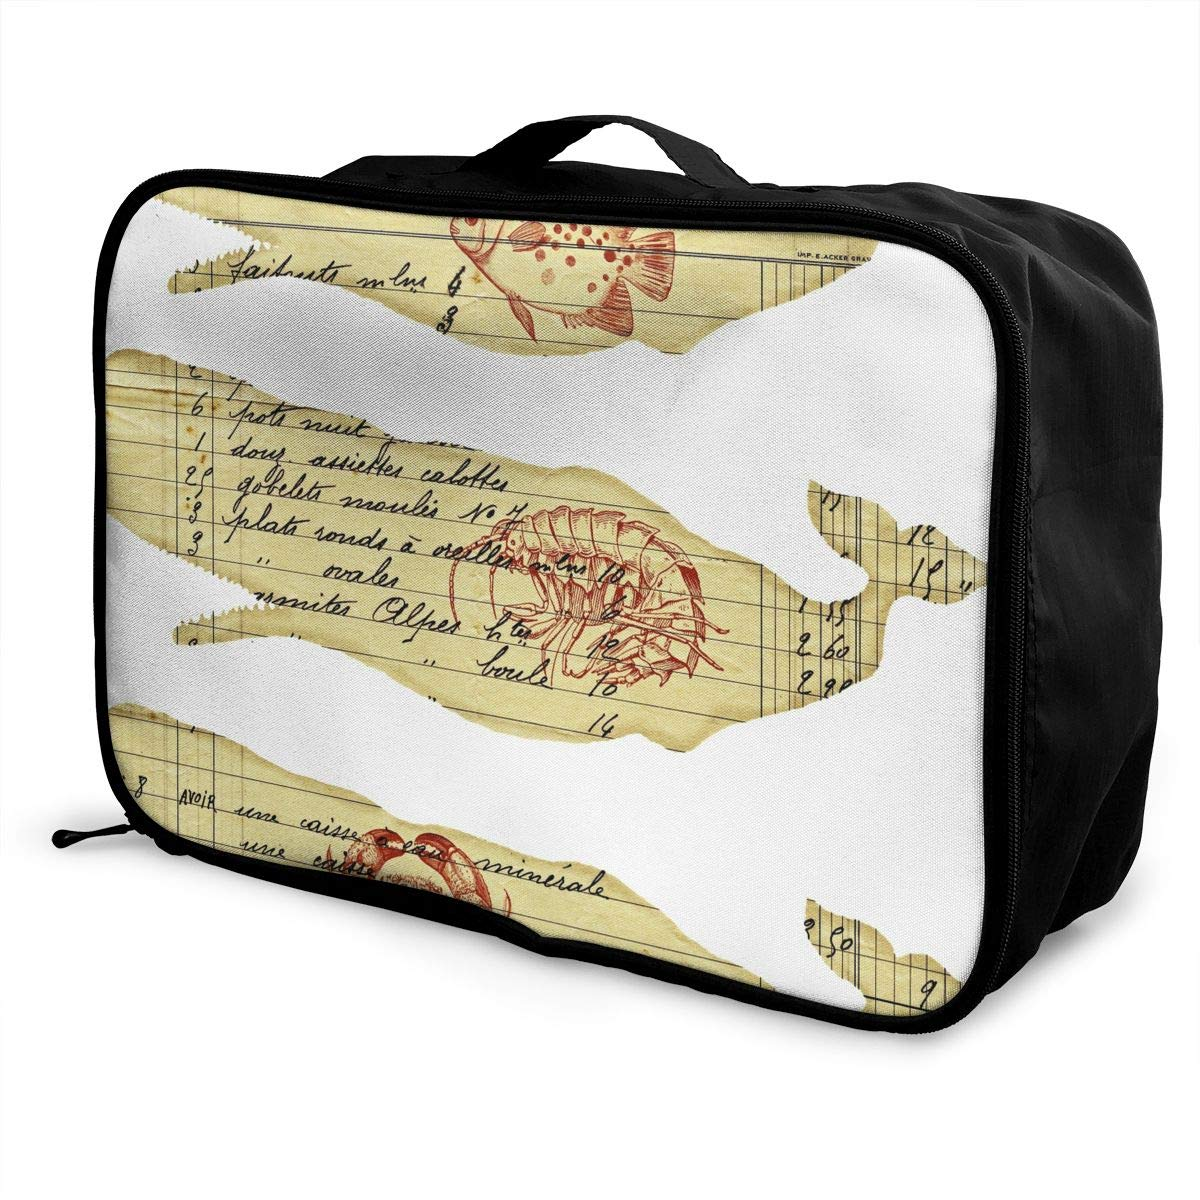 ADGAI Big Shark Eats Fish and Shrimp and Crab Canvas Travel Weekender Bag,Fashion Custom Lightweight Large Capacity Portable Luggage Bag,Suitcase Trolley Bag